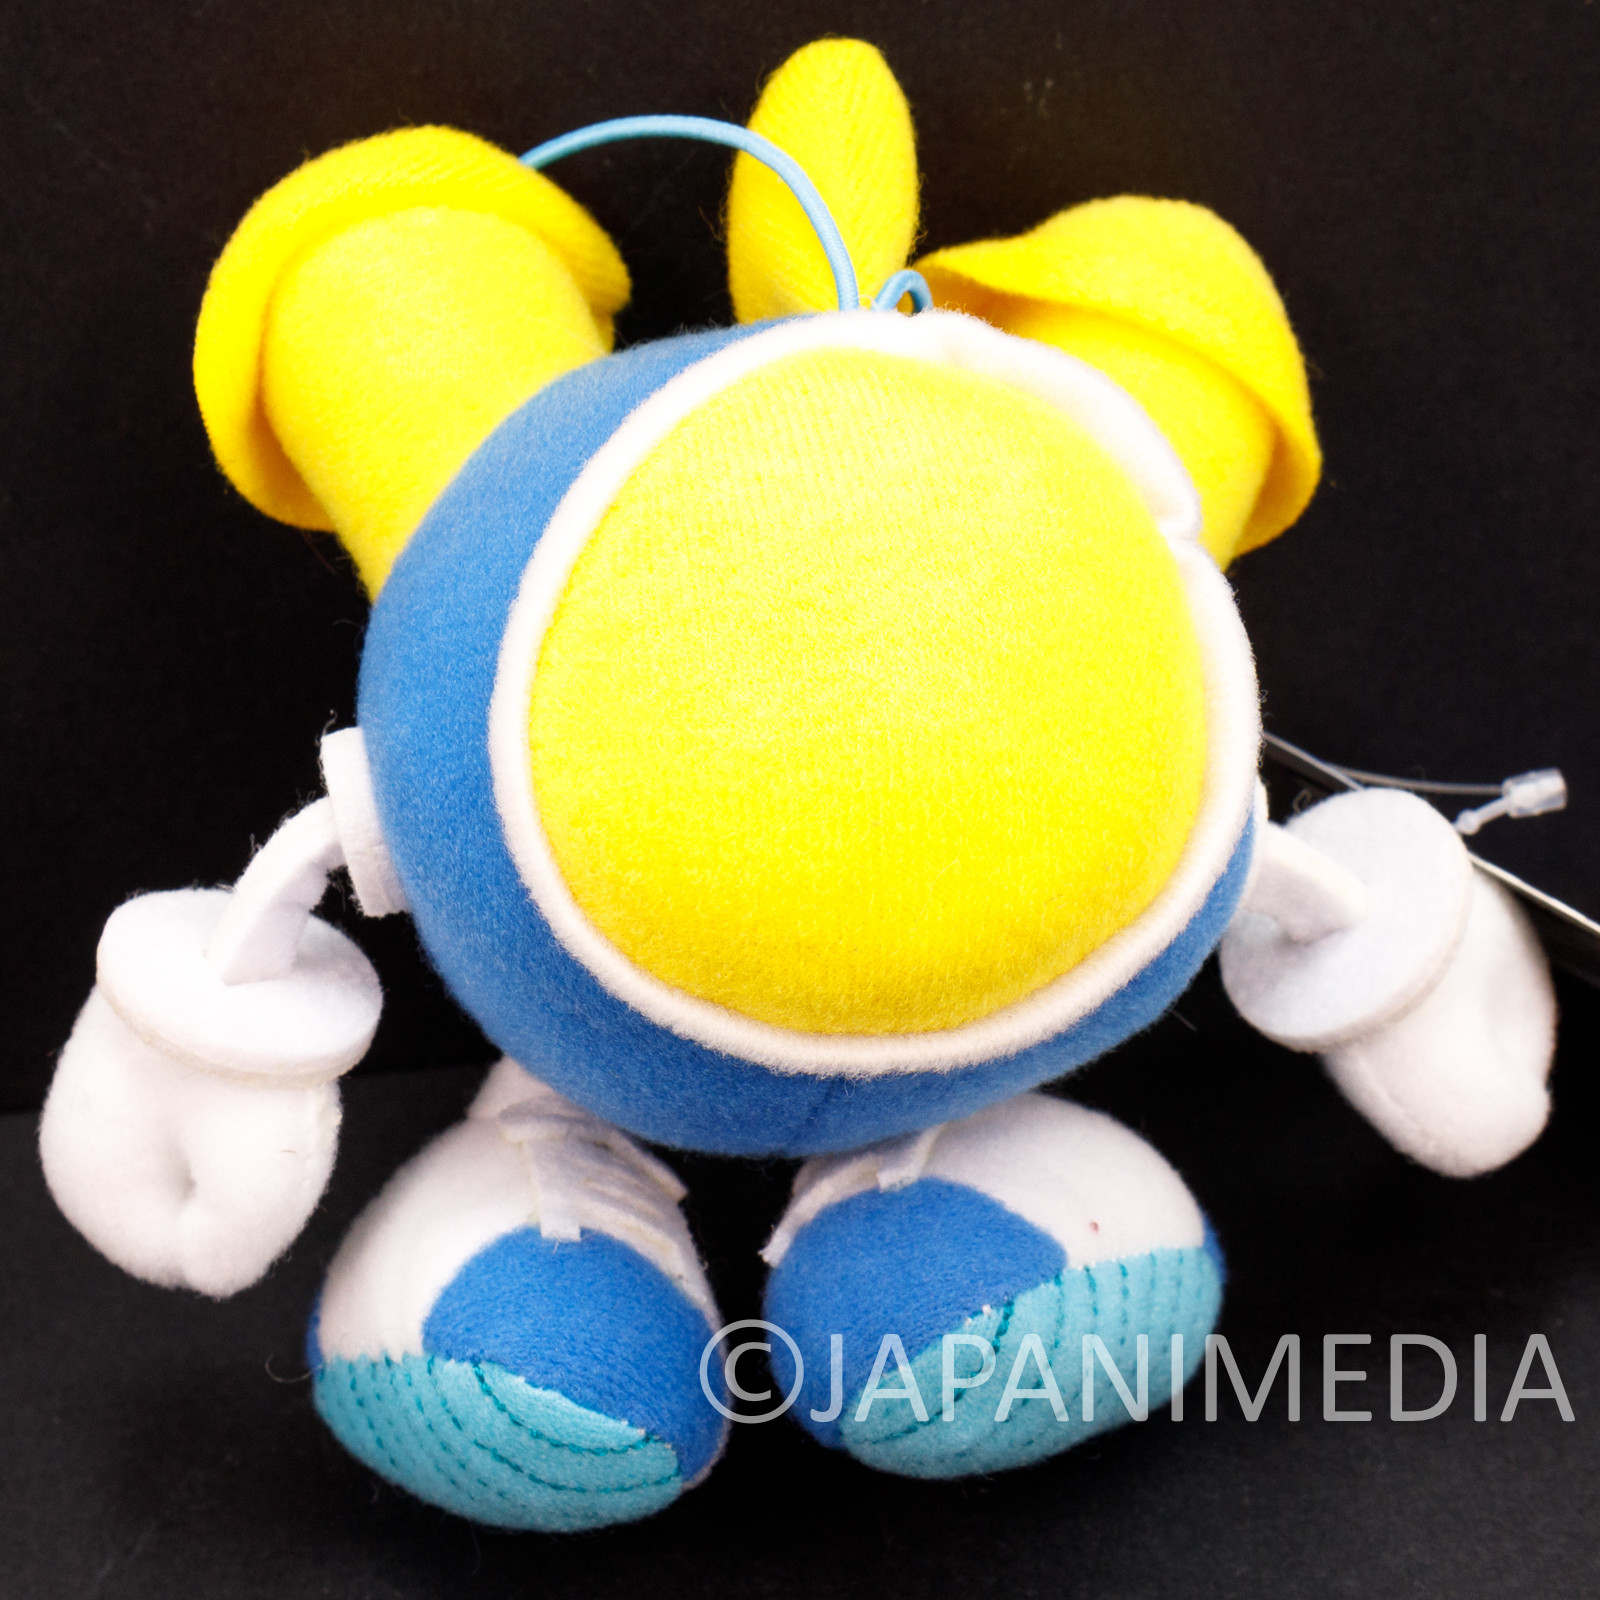 RARE! TwinBee Plush Doll JAPAN GAME FAMICOM NES